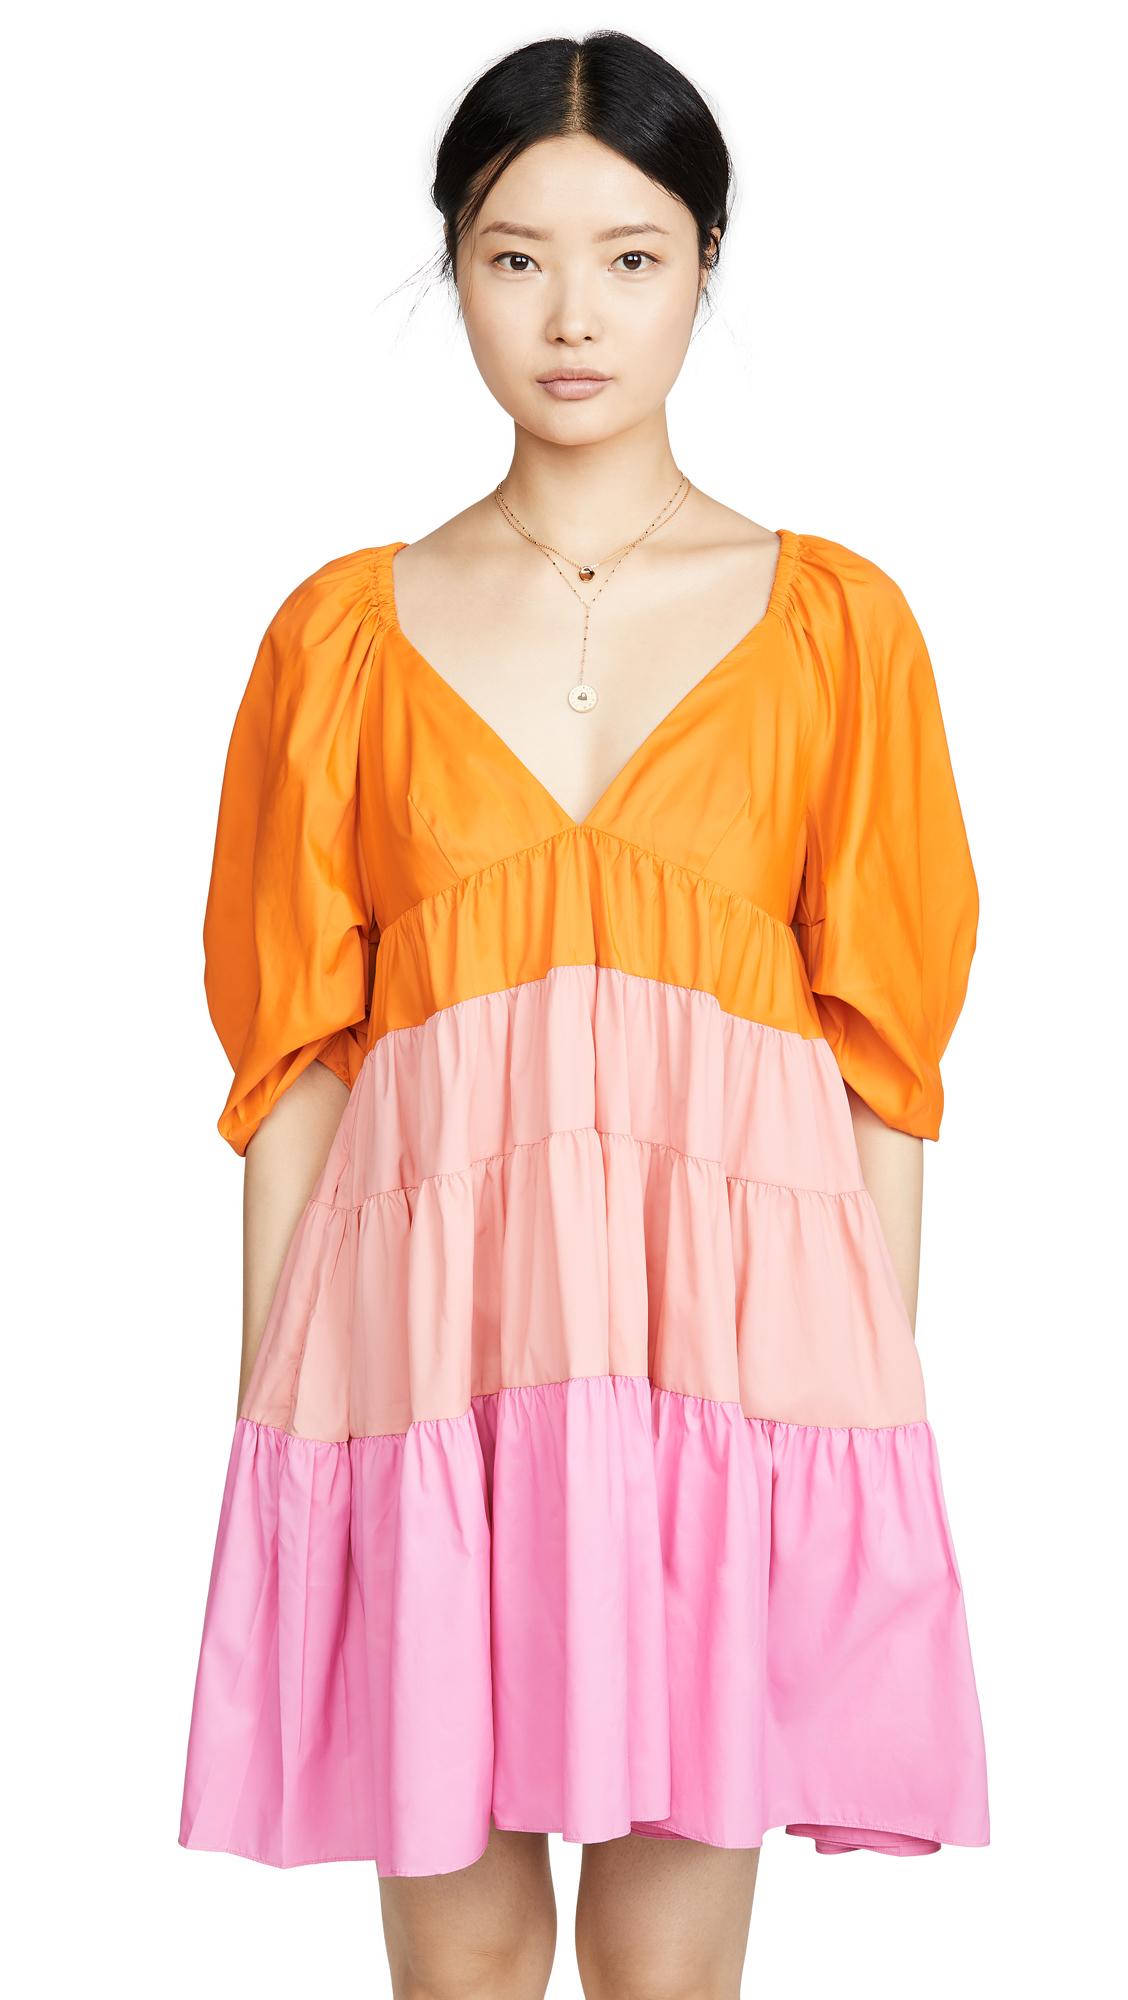 STAUD Mini Meadow Dress - 30% Off Sale